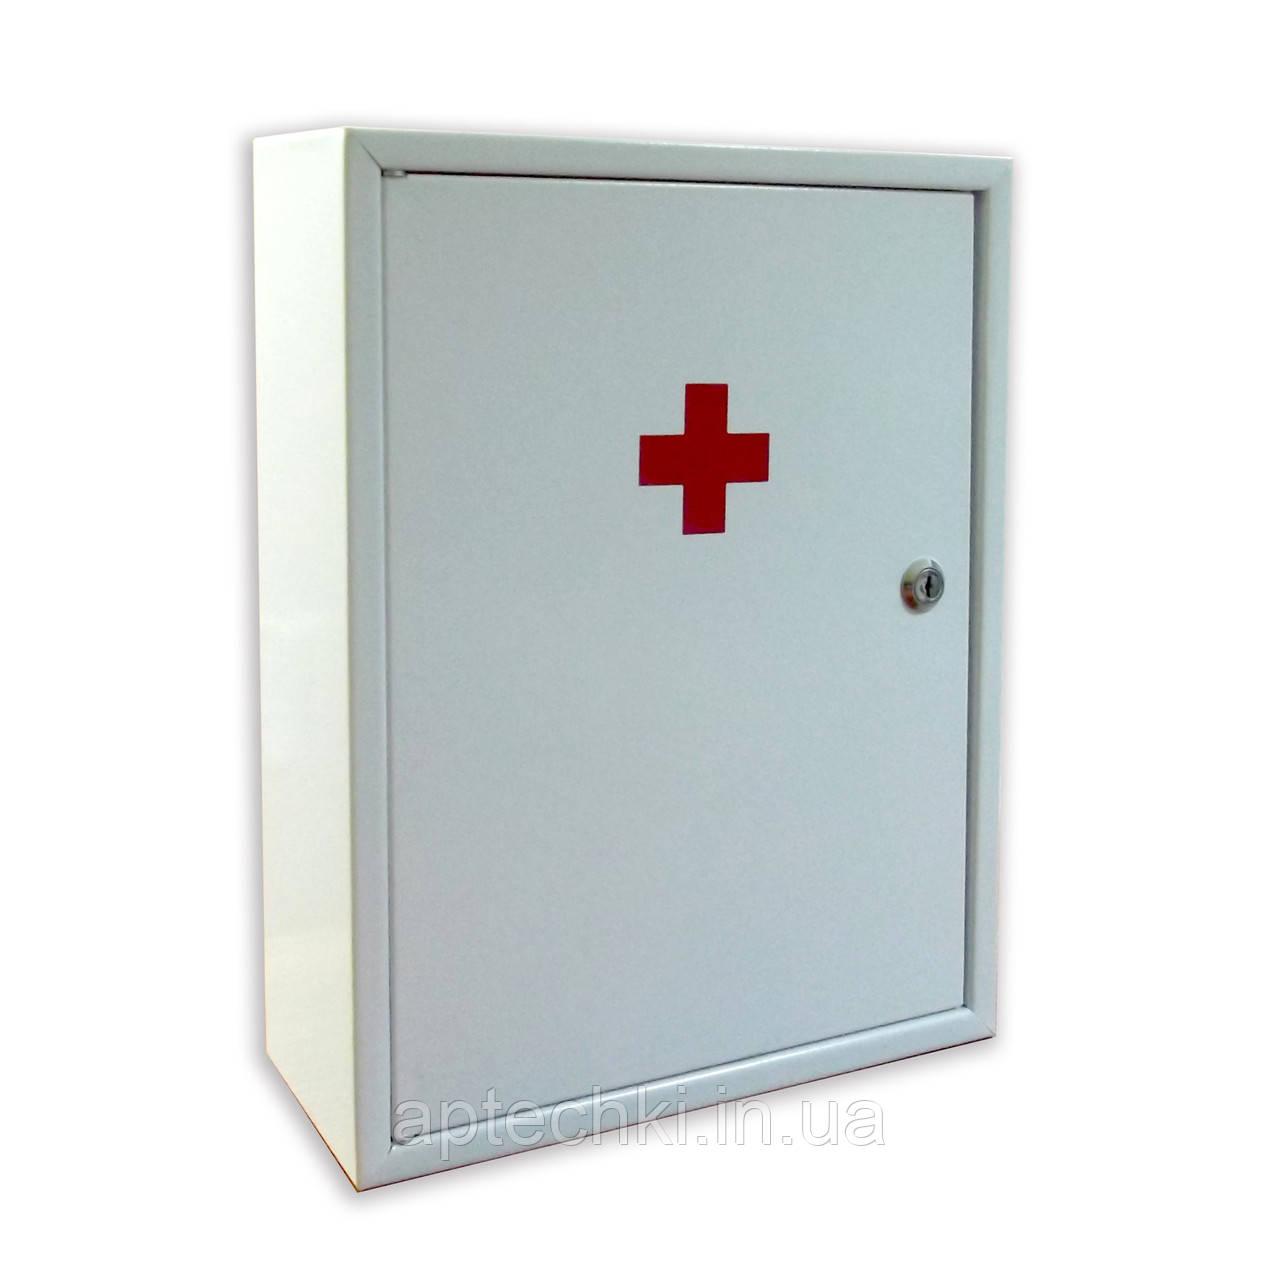 Шкафчик для аптечки, металл